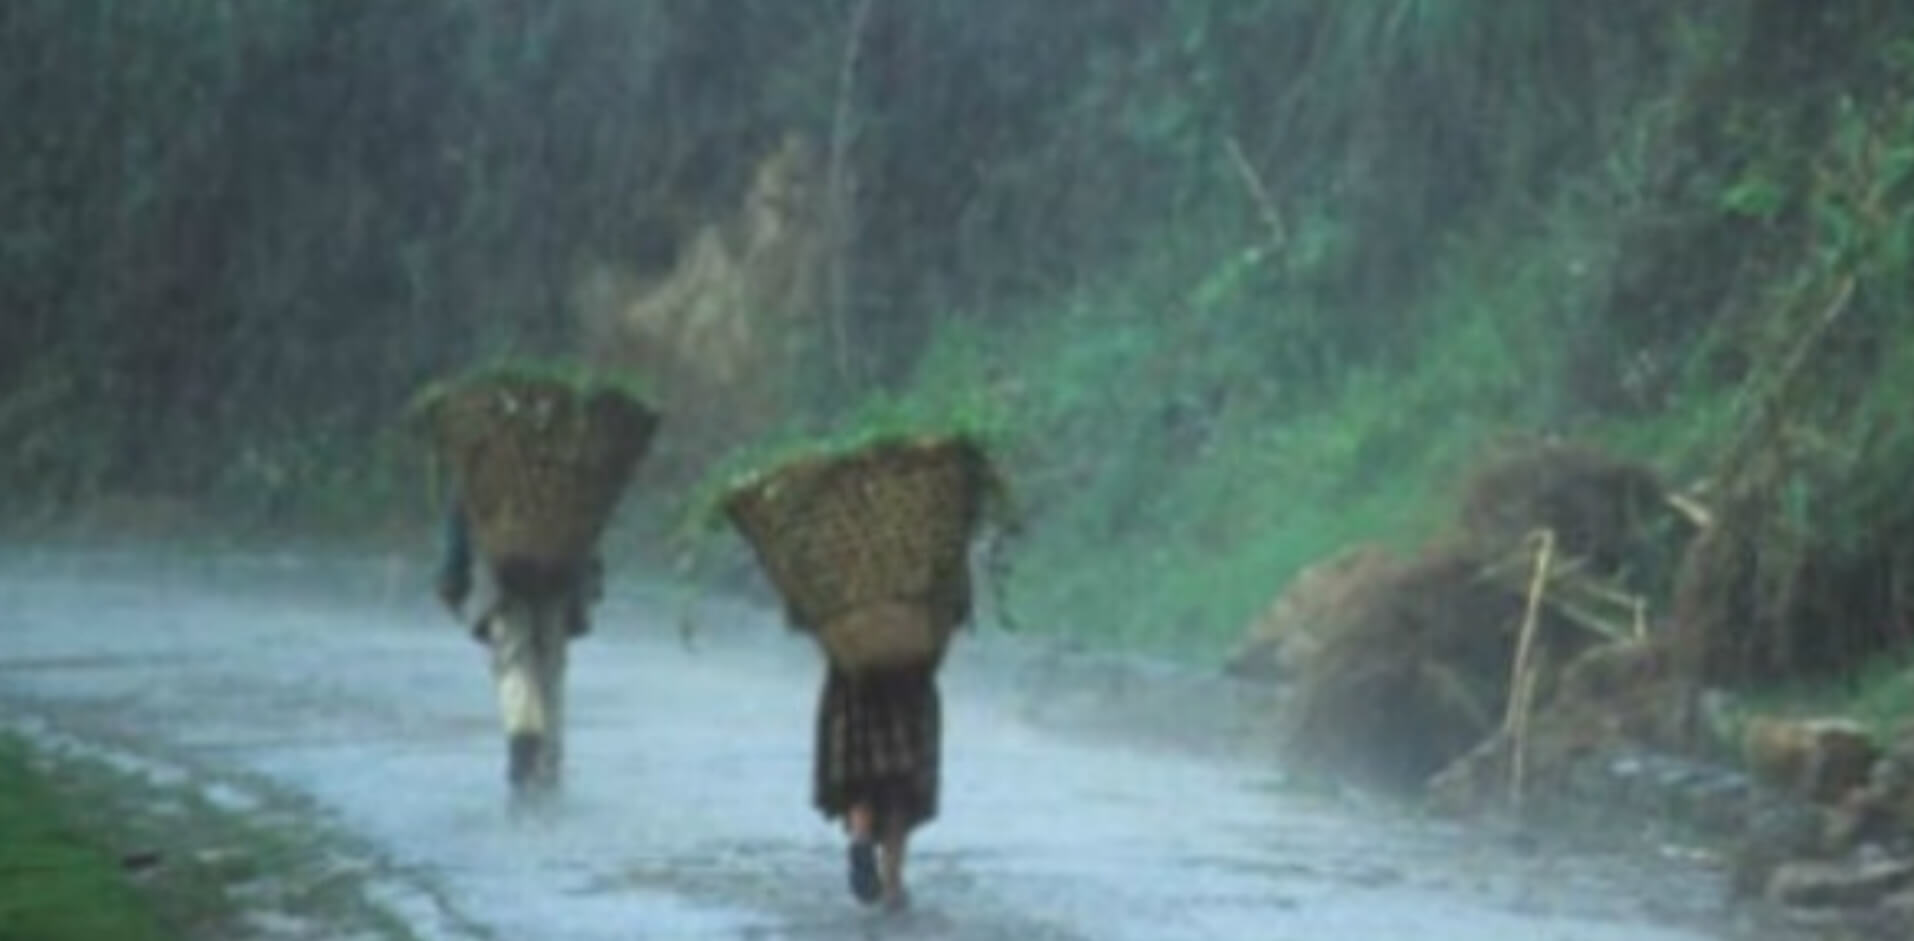 Heavy rainfallwarning